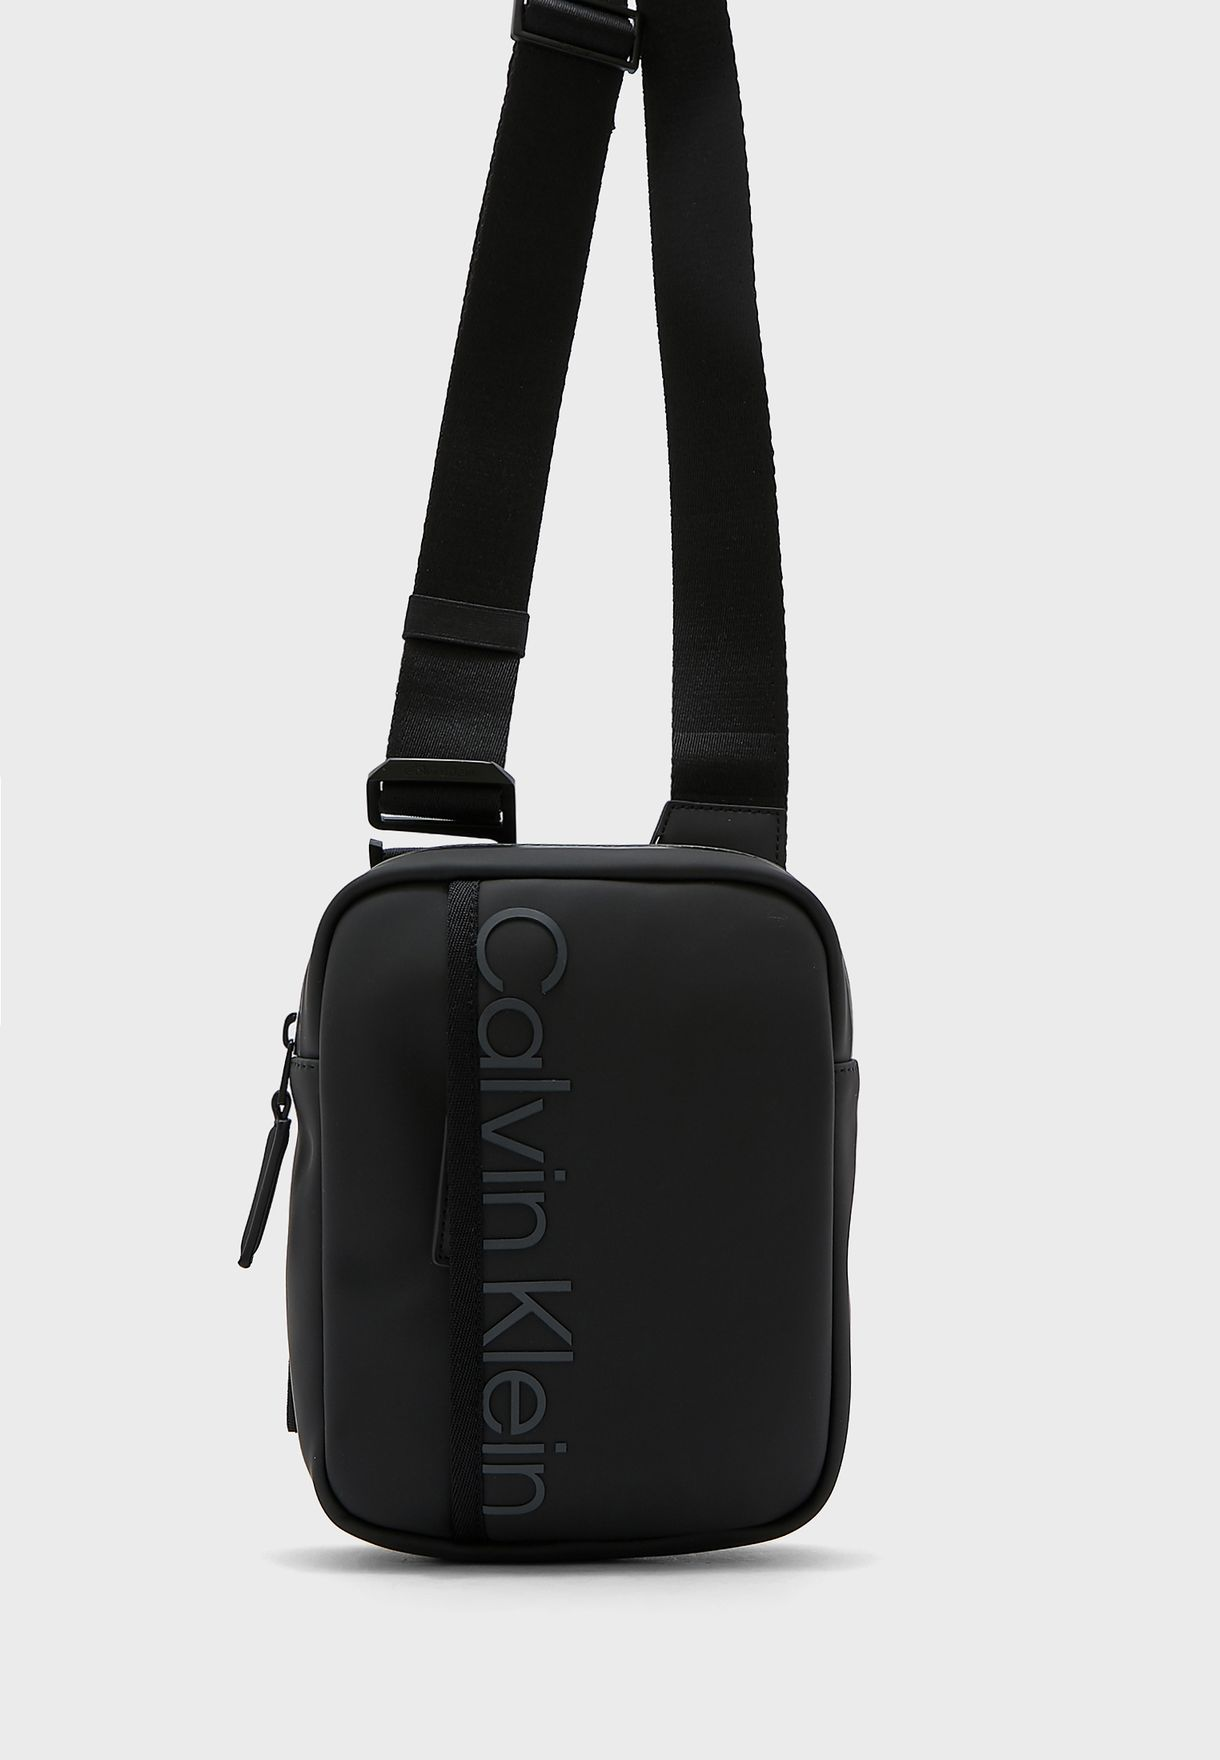 Reporter Messenger Bag